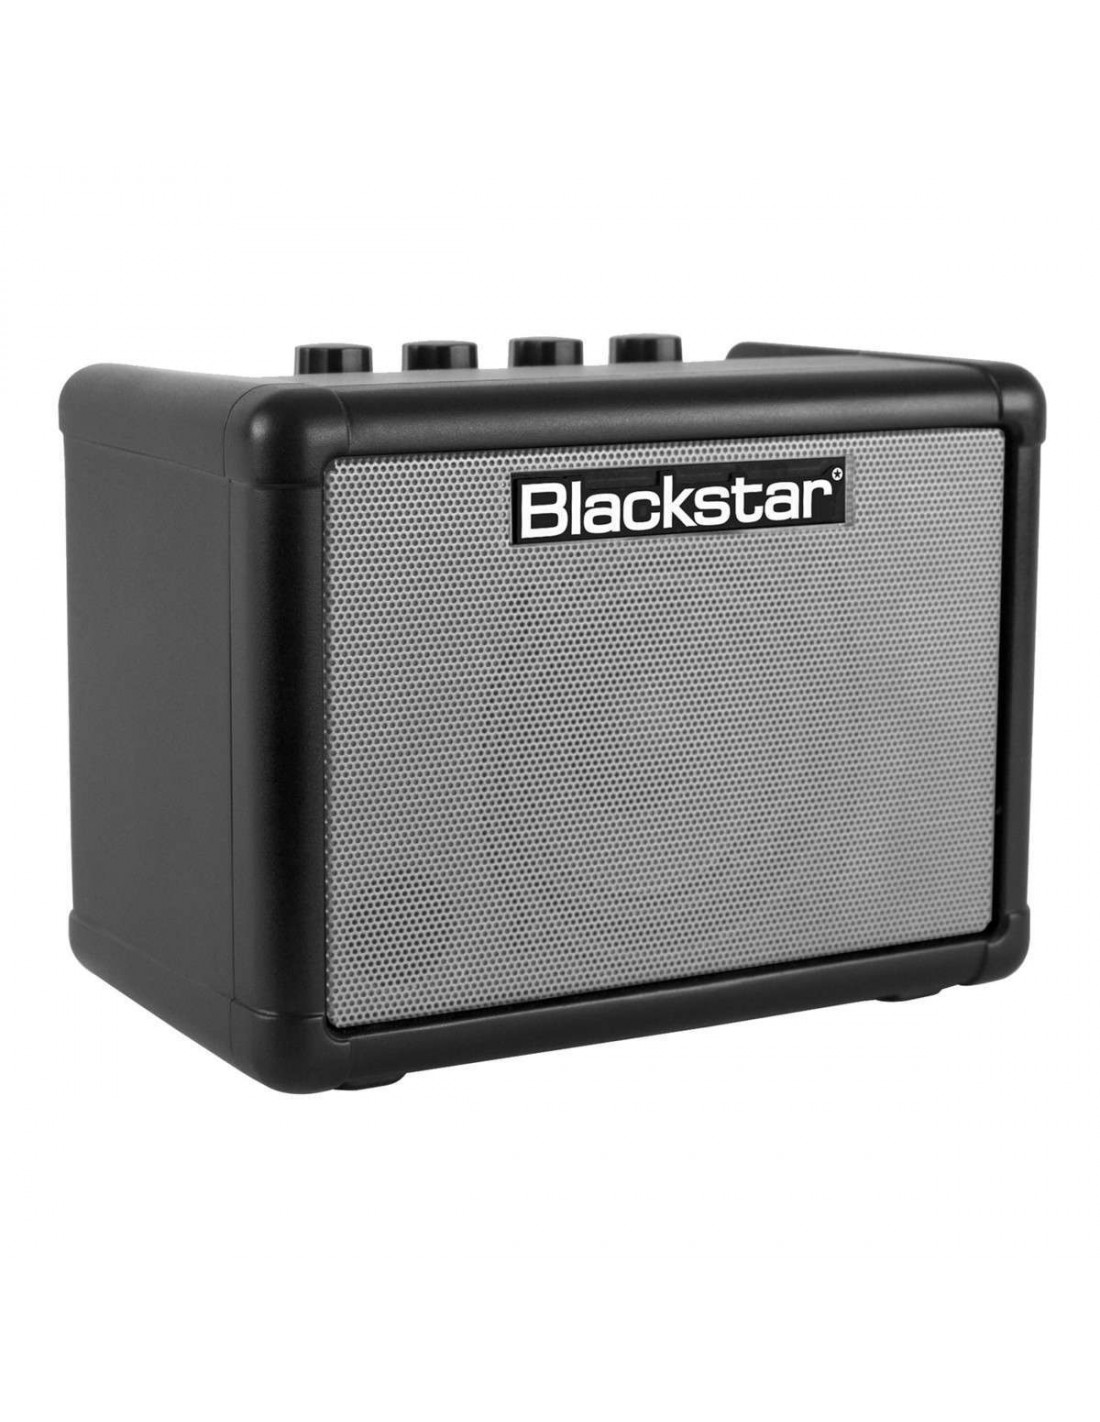 Blackstar Fly 3 Bass Mini Amplifier